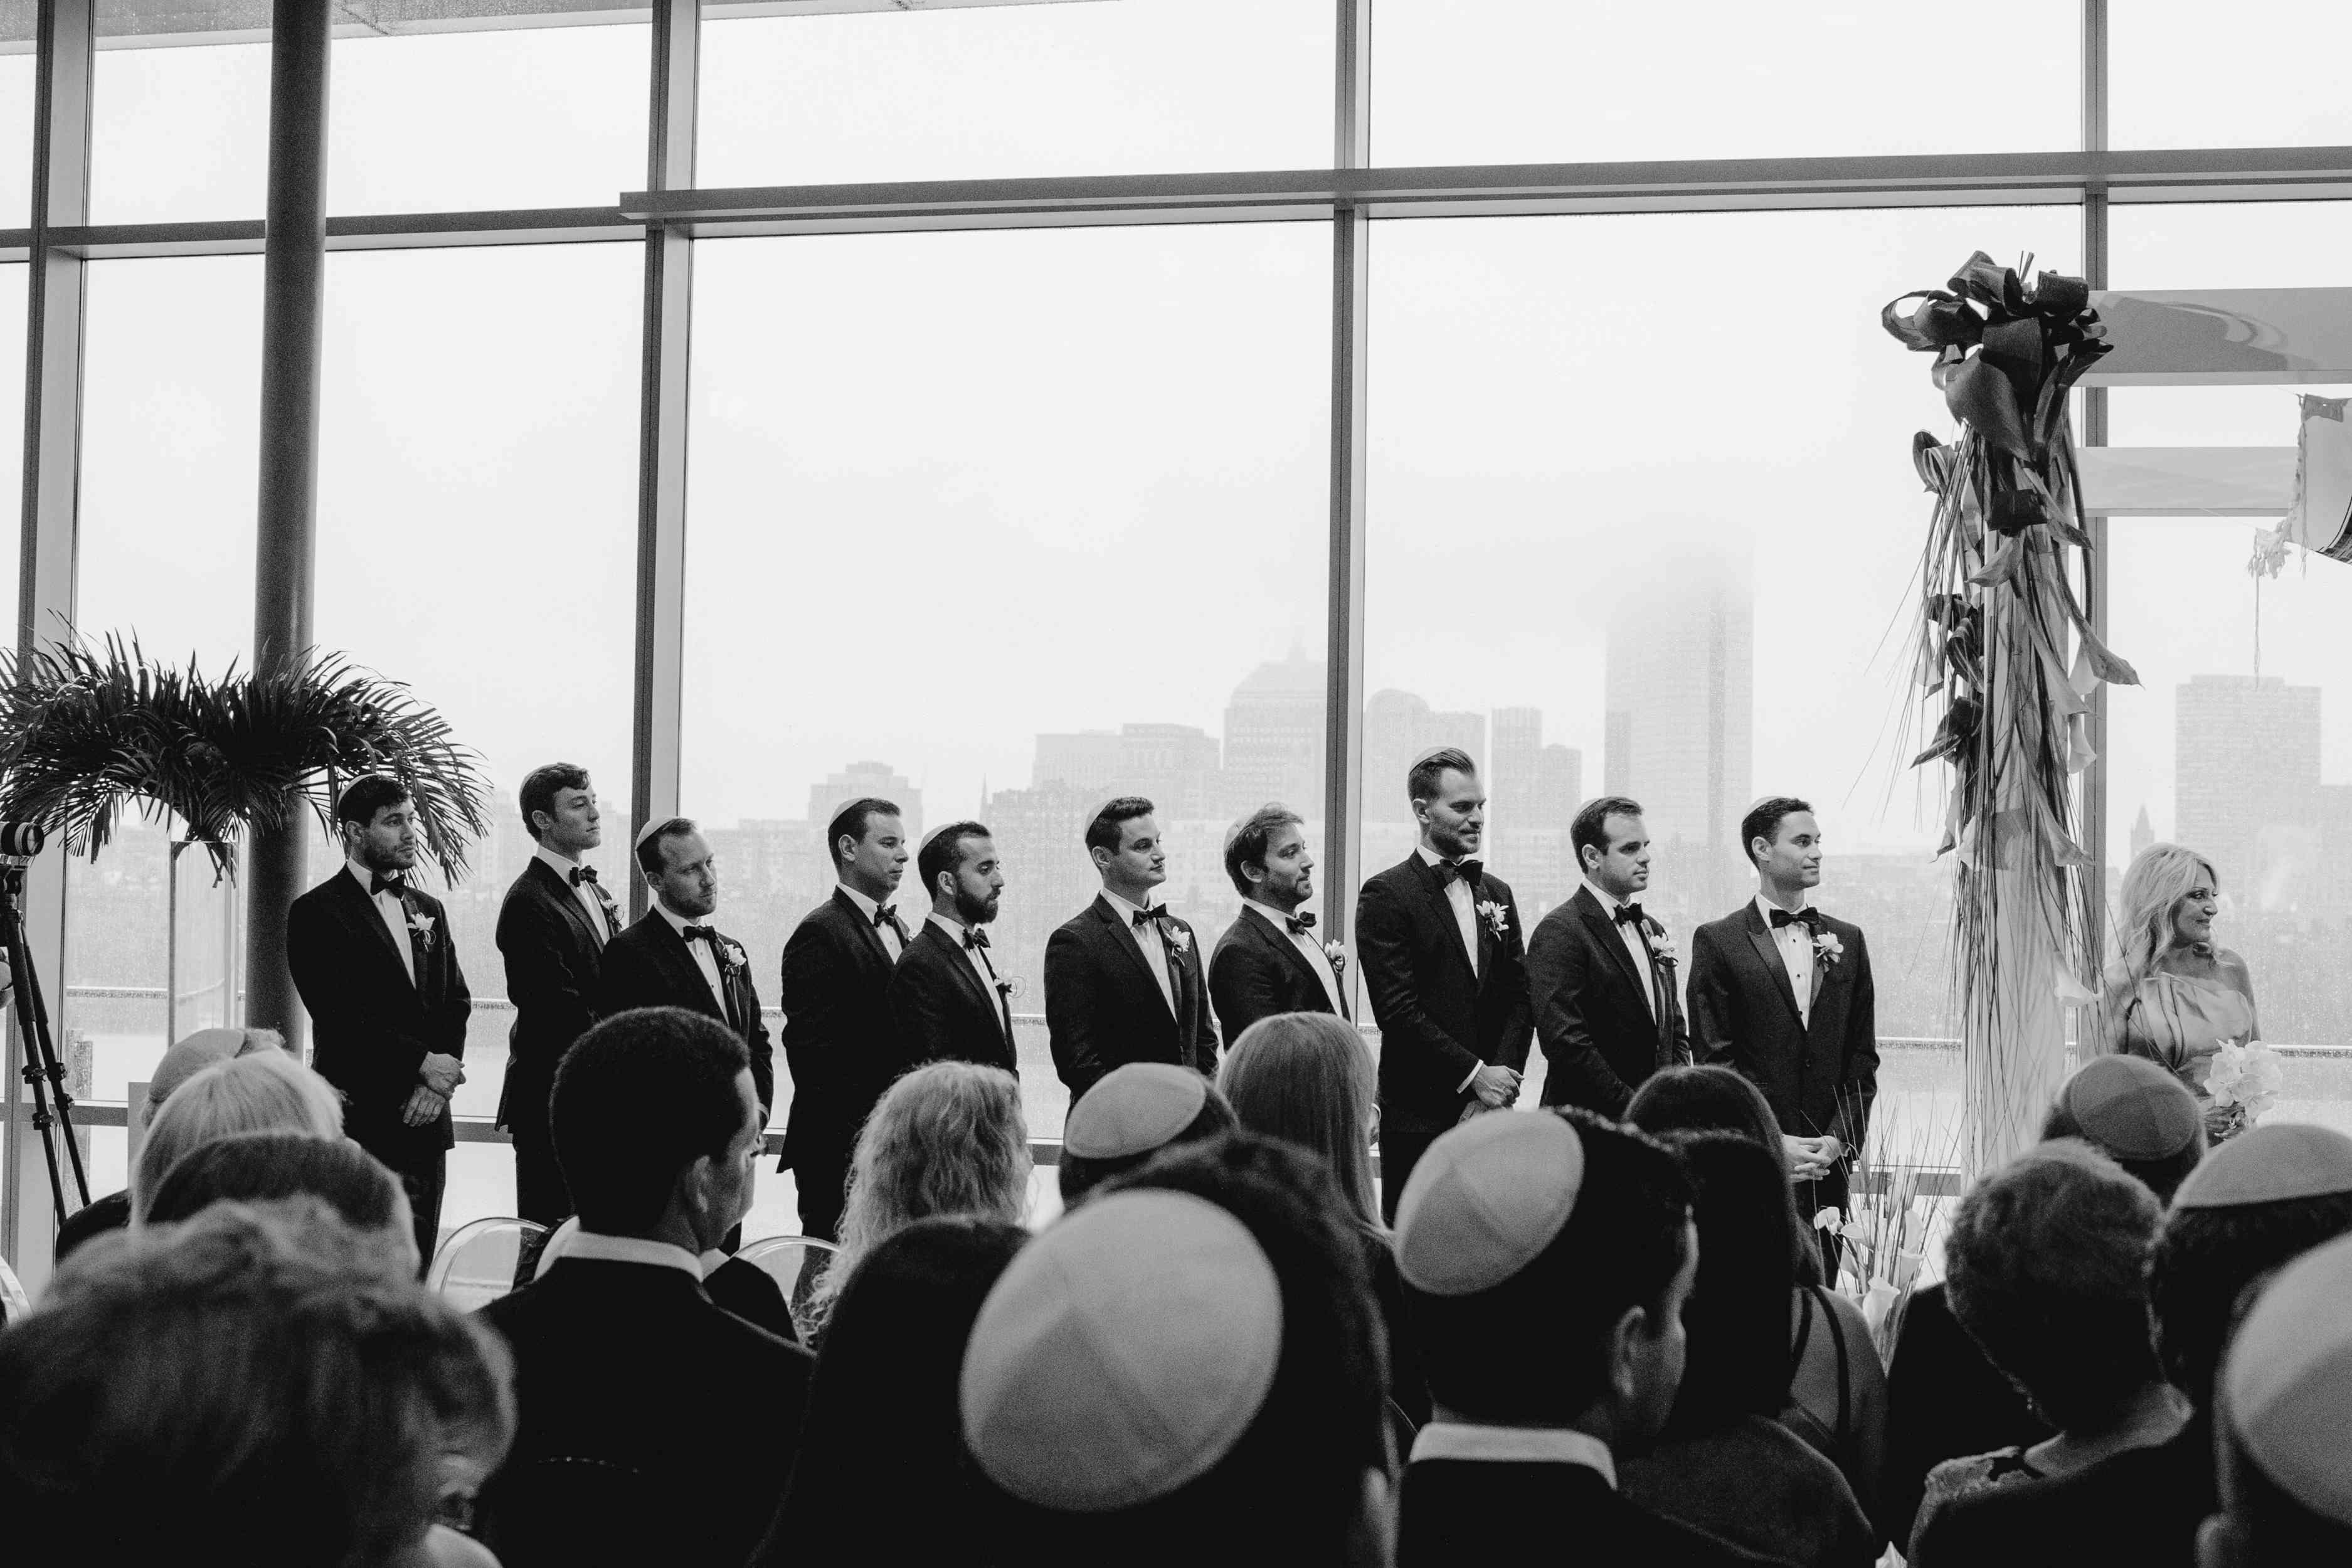 Groomsmen at the Altar